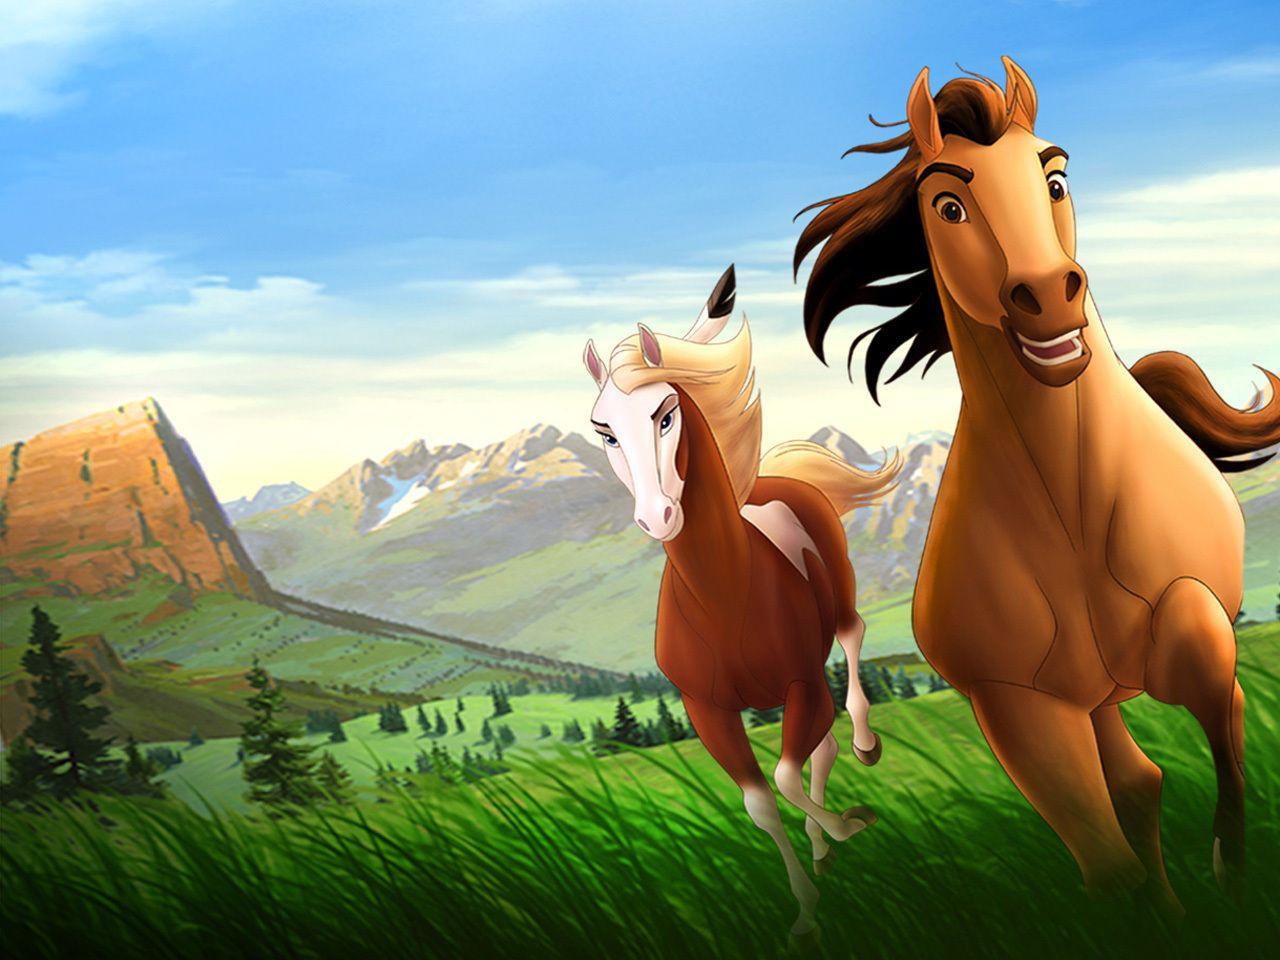 Spirit Stallion Of The Cimarron Wallpaper Spirit And Rain Spirit And Rain Spirit The Horse Horse Movies